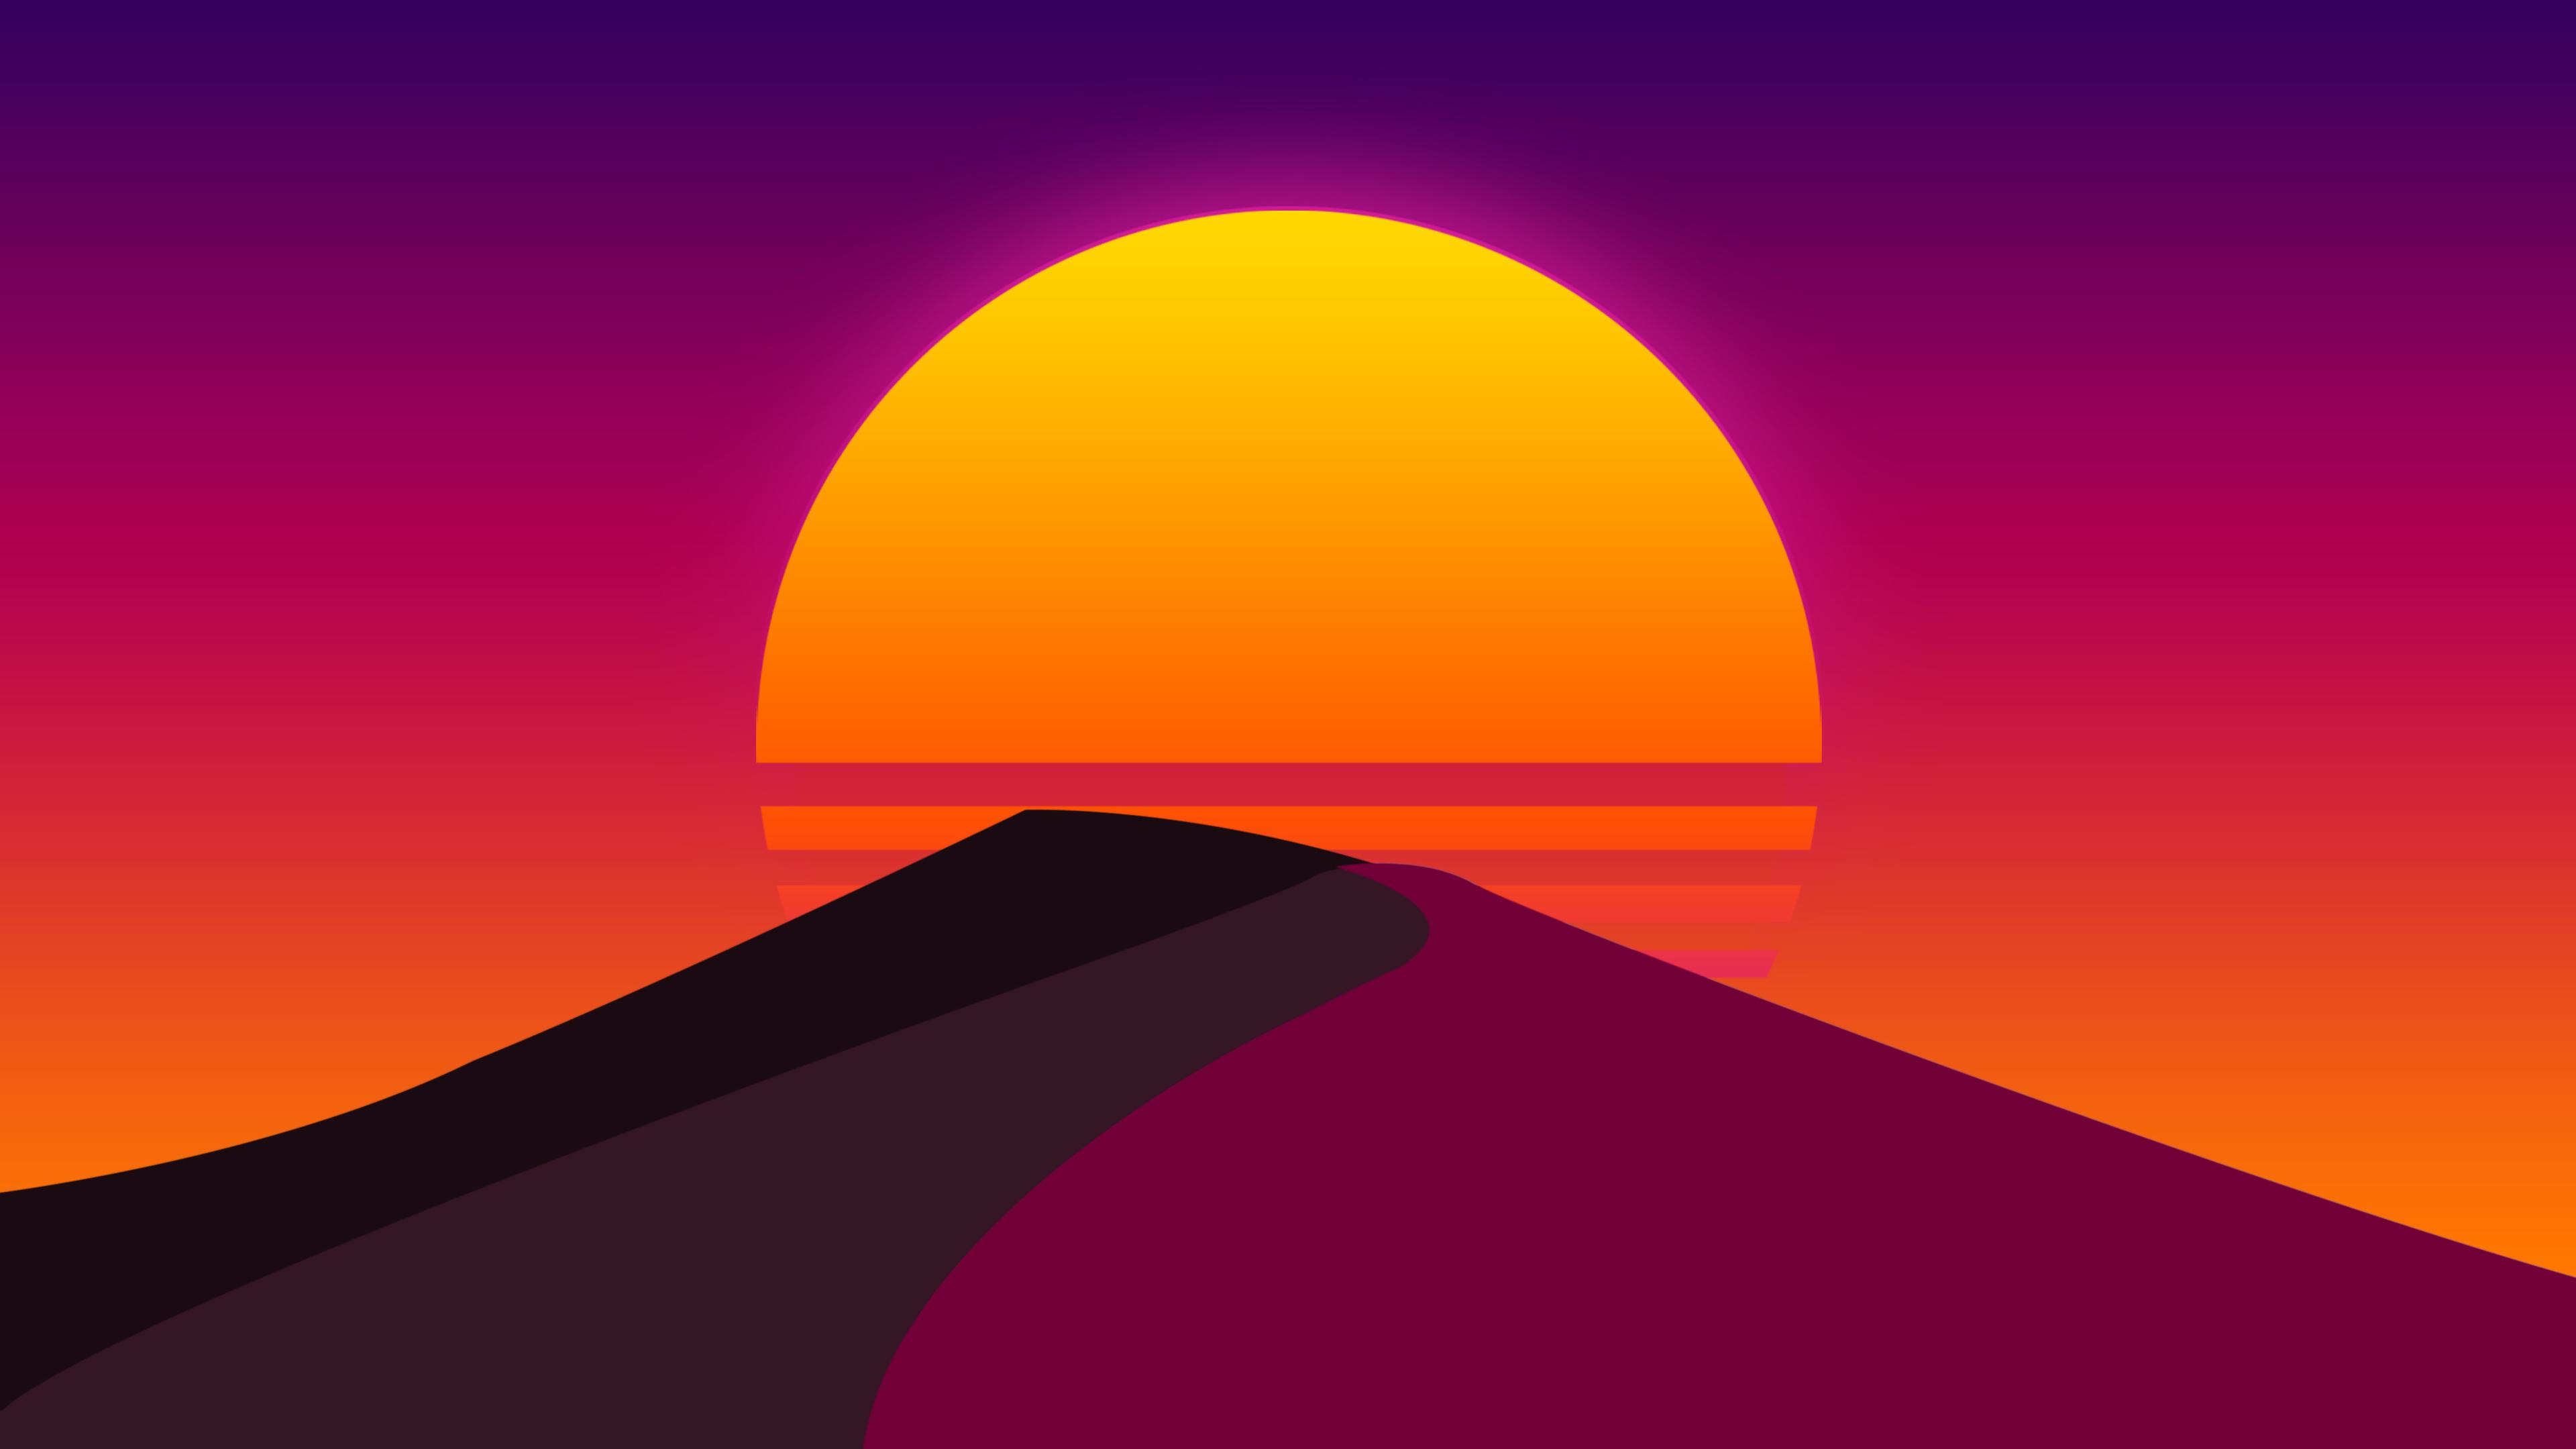 sun desert abstract artwork 1551645496 - Sun Desert Abstract Artwork - reddit wallpapers, hd-wallpapers, digital art wallpapers, artwork wallpapers, abstract wallpapers, 4k-wallpapers